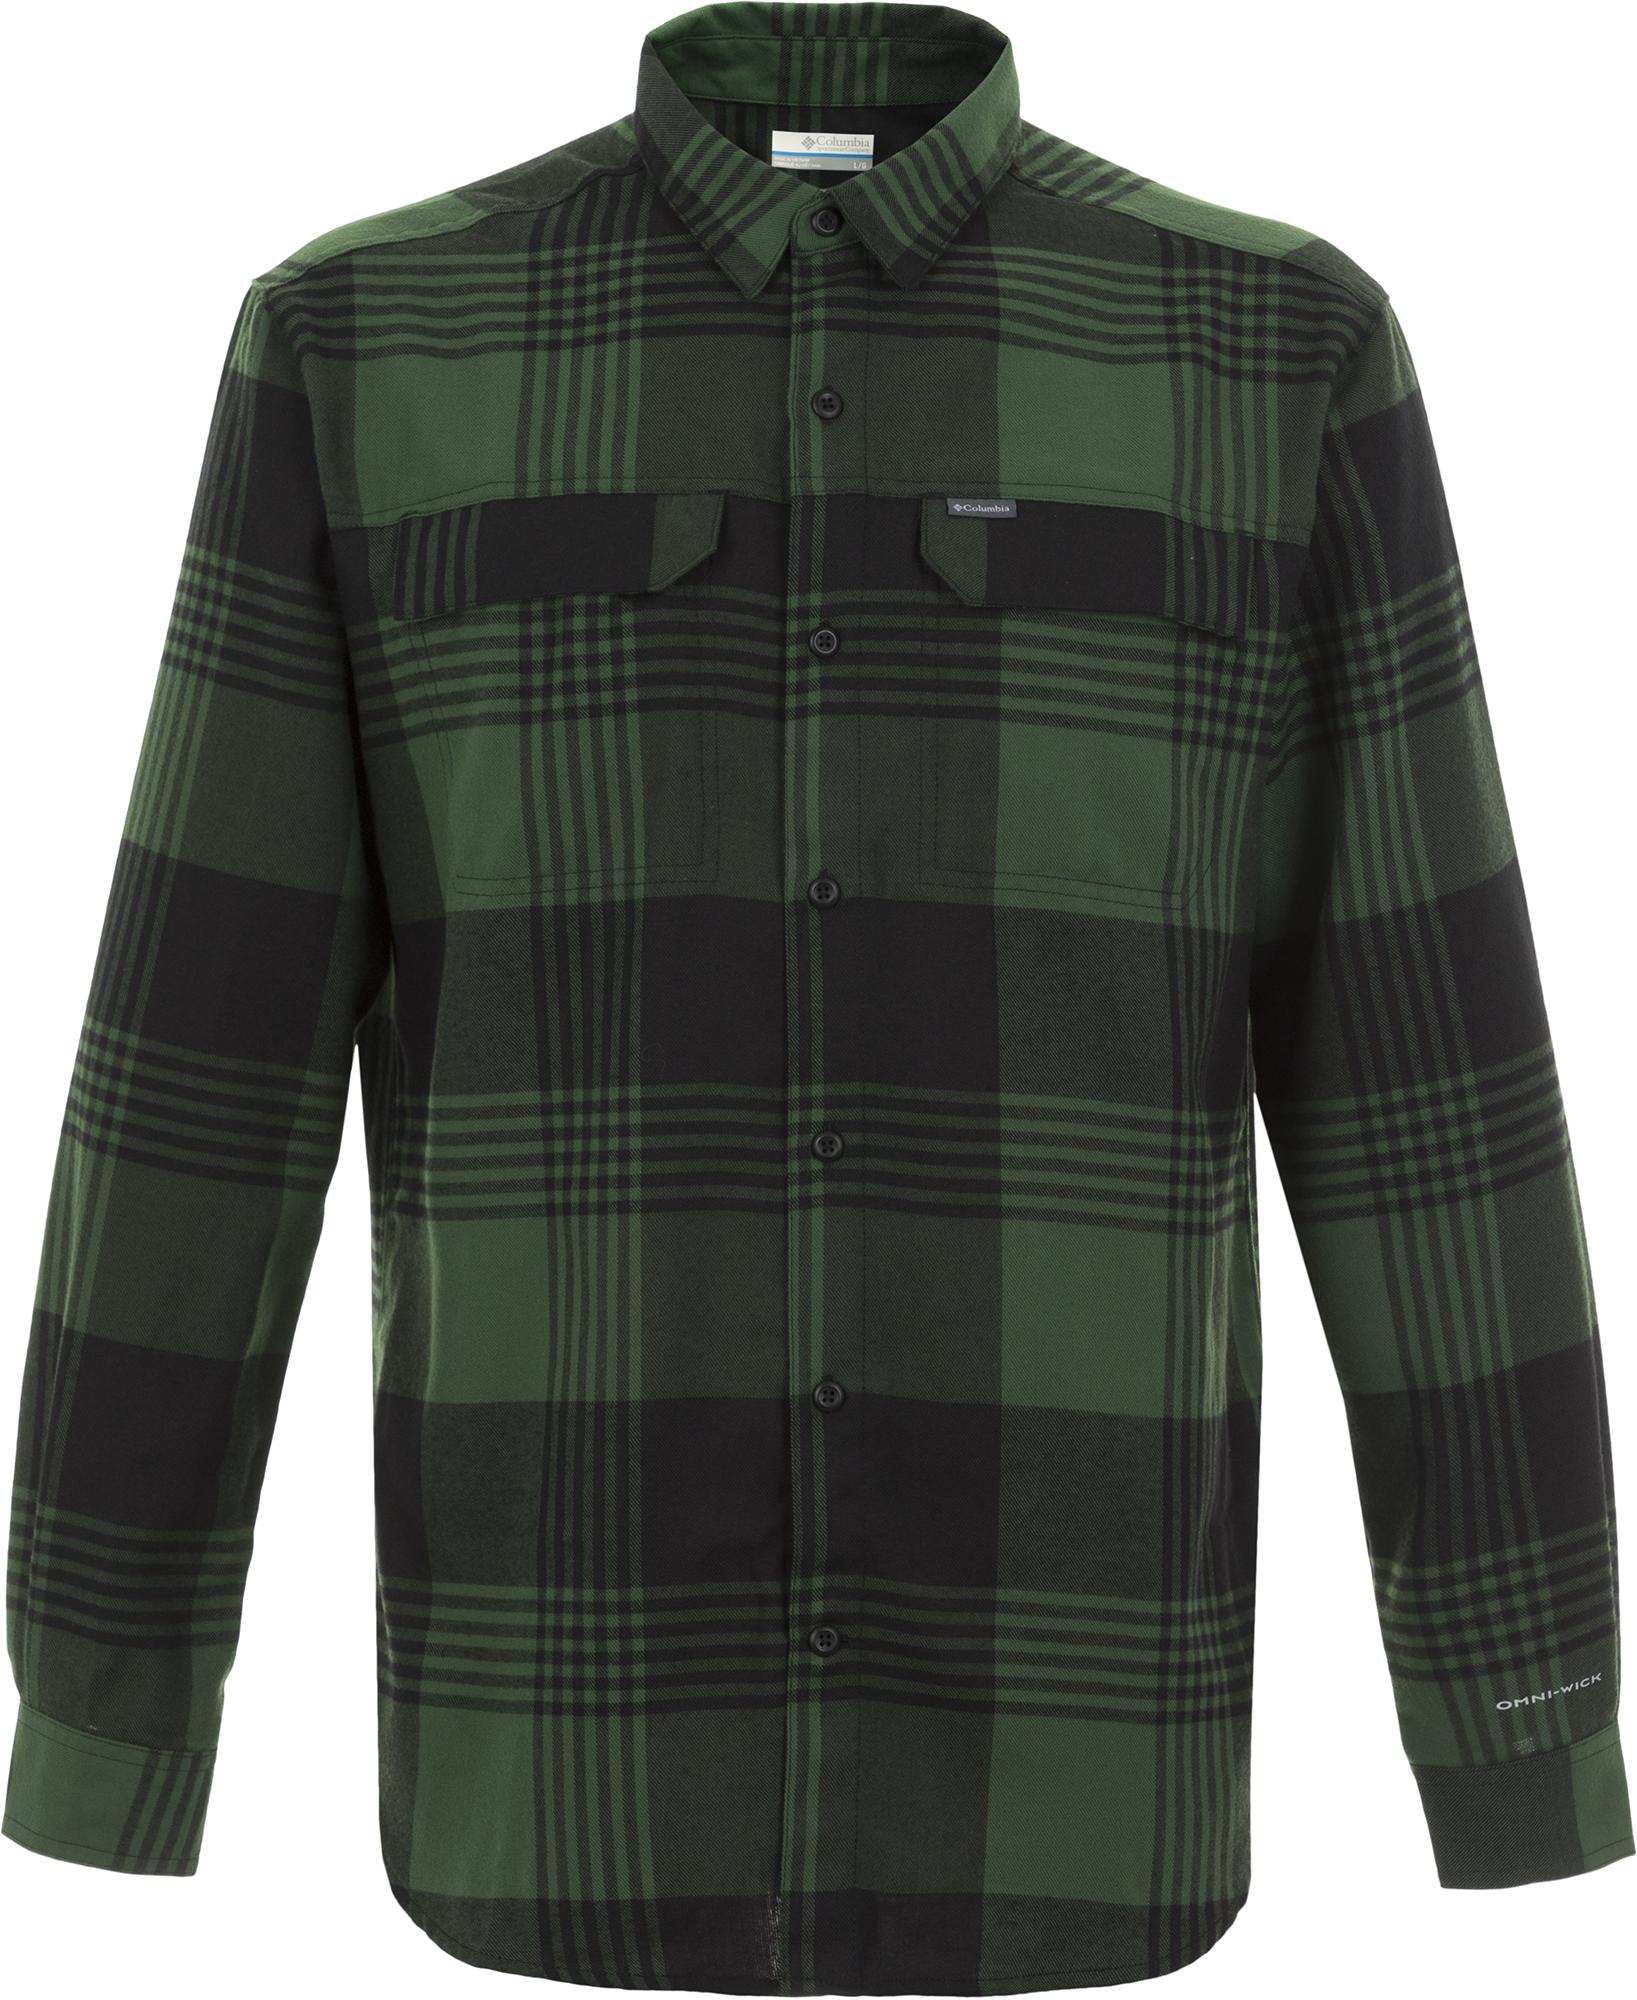 Columbia Рубашка мужская Columbia Silver Ridge 2.0, размер 52-54 рубашка мужская hstyle qo4016 2015